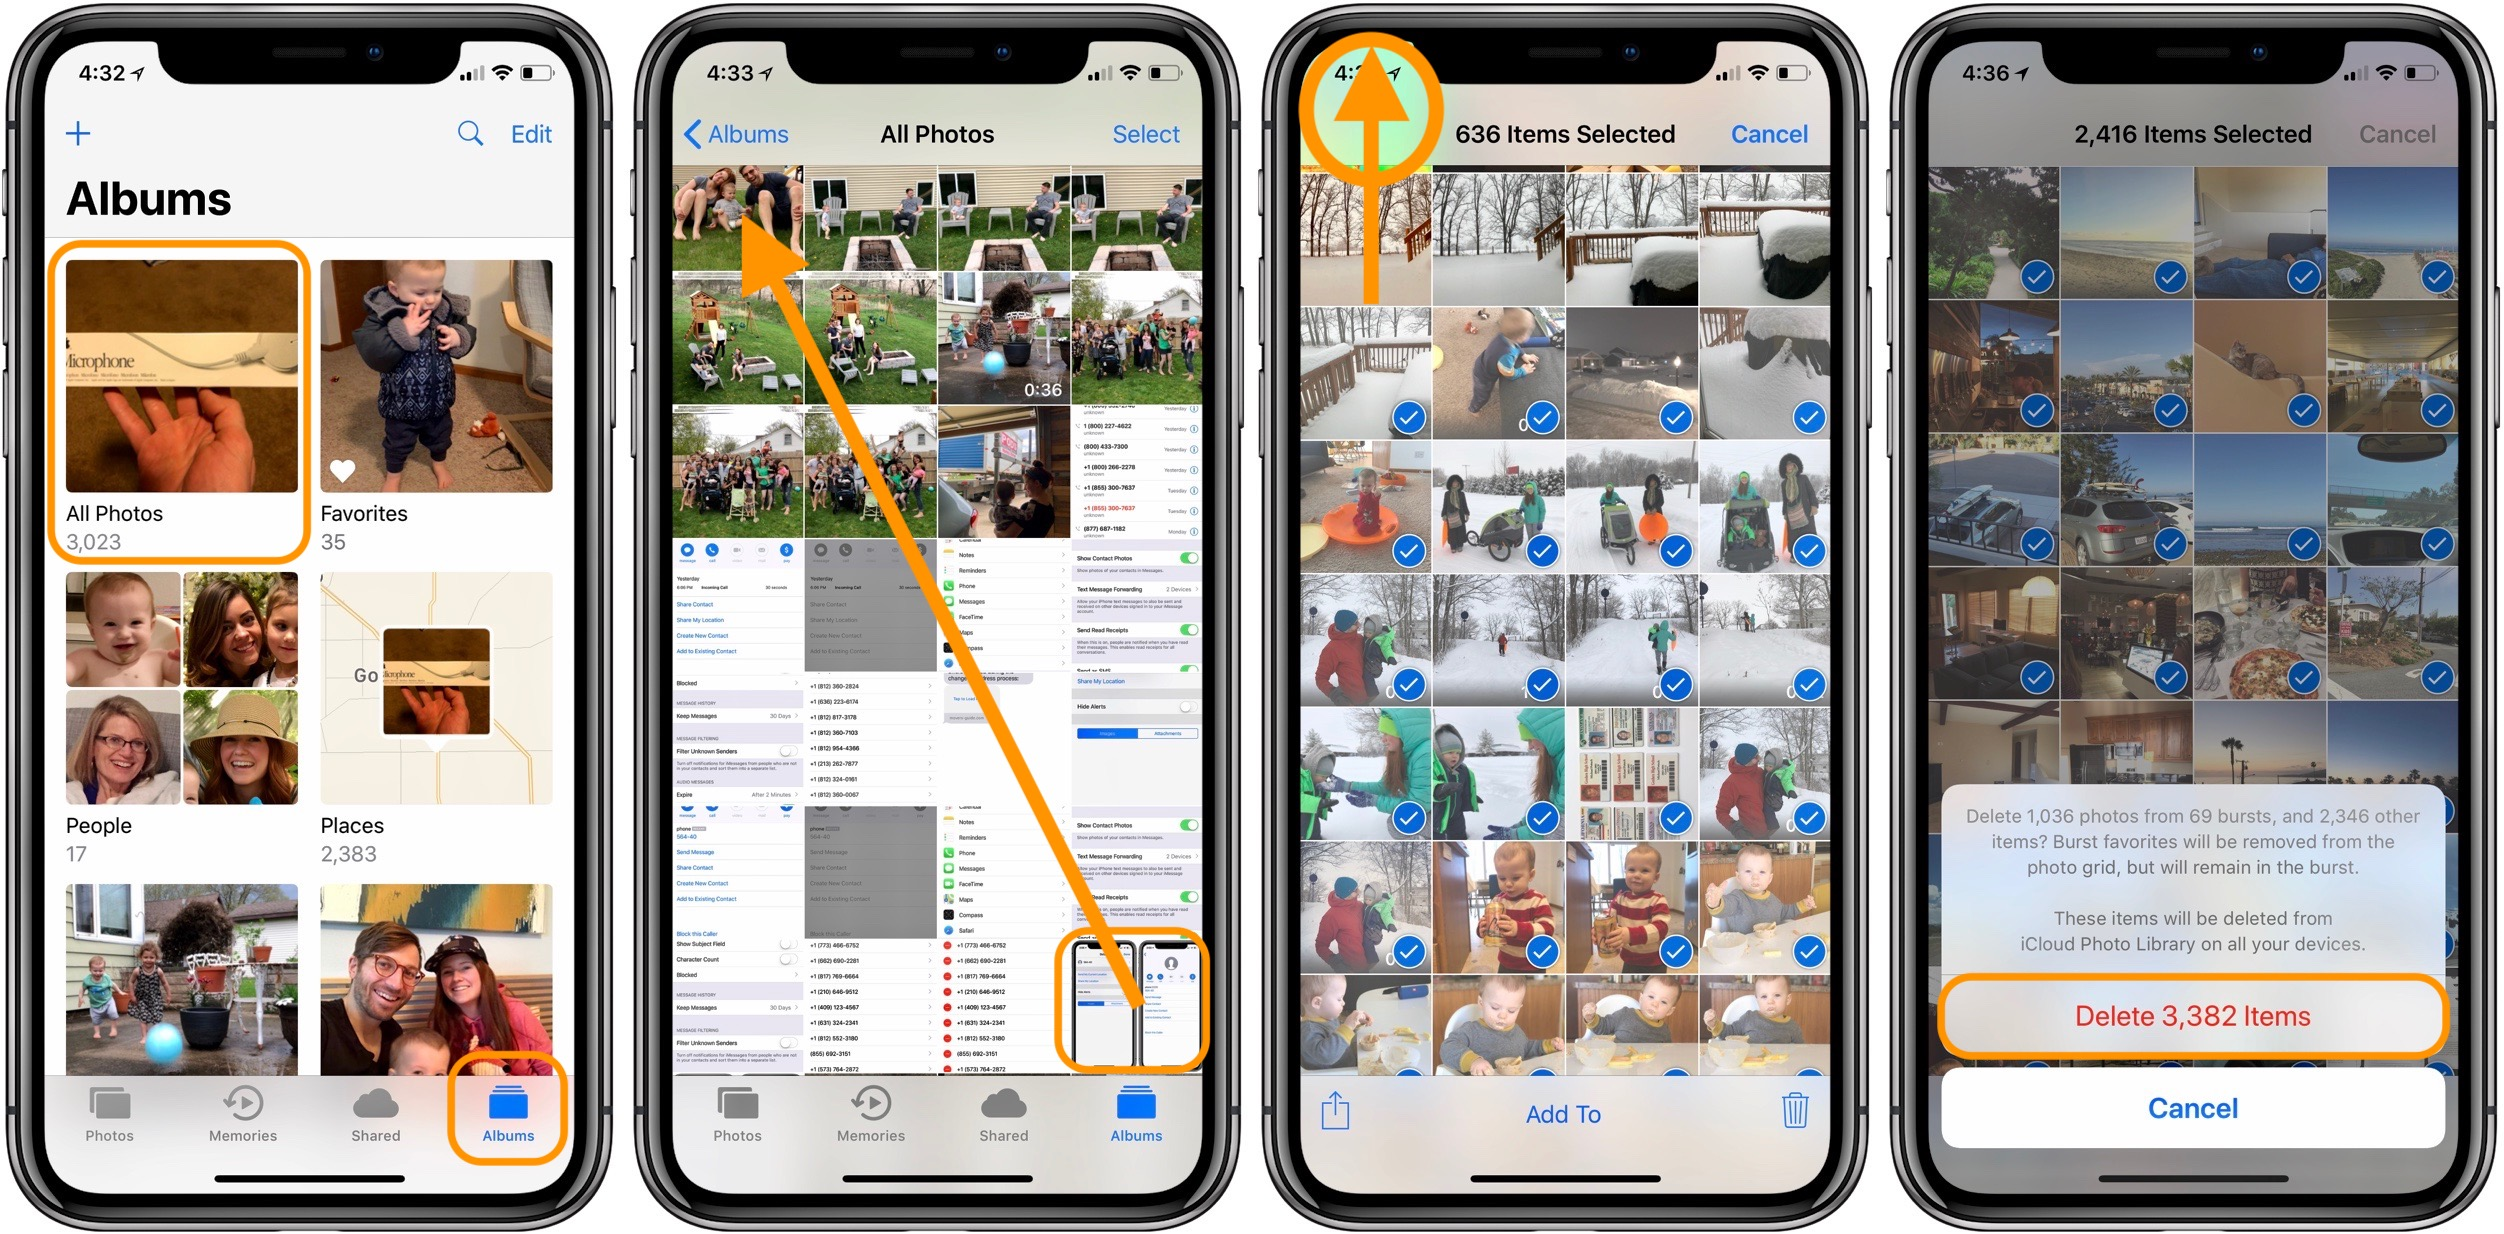 Body Tracker iOS App - A great mobile Body